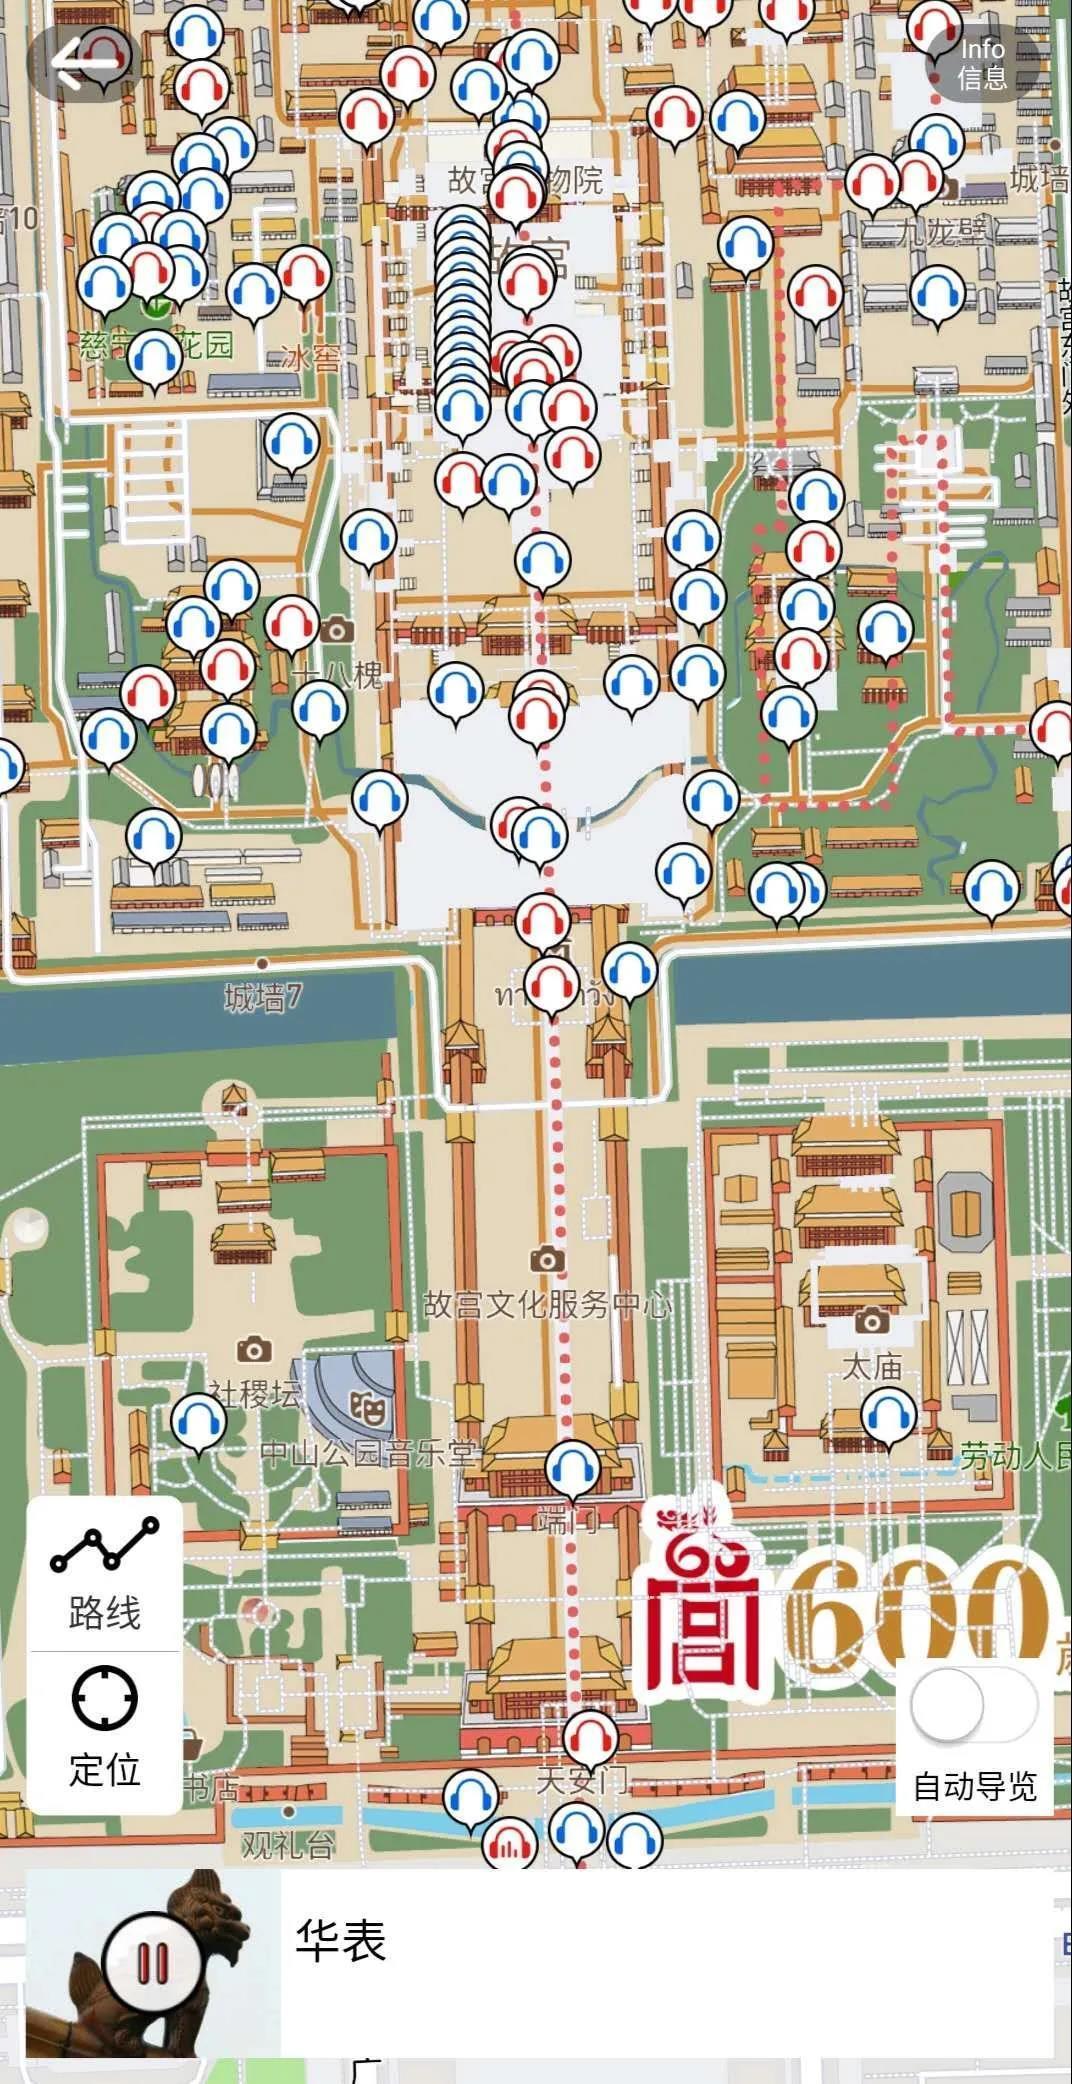 5ff9a4d63ffa7d37b3d7ccff 安卓手机的游览世界景观软件。